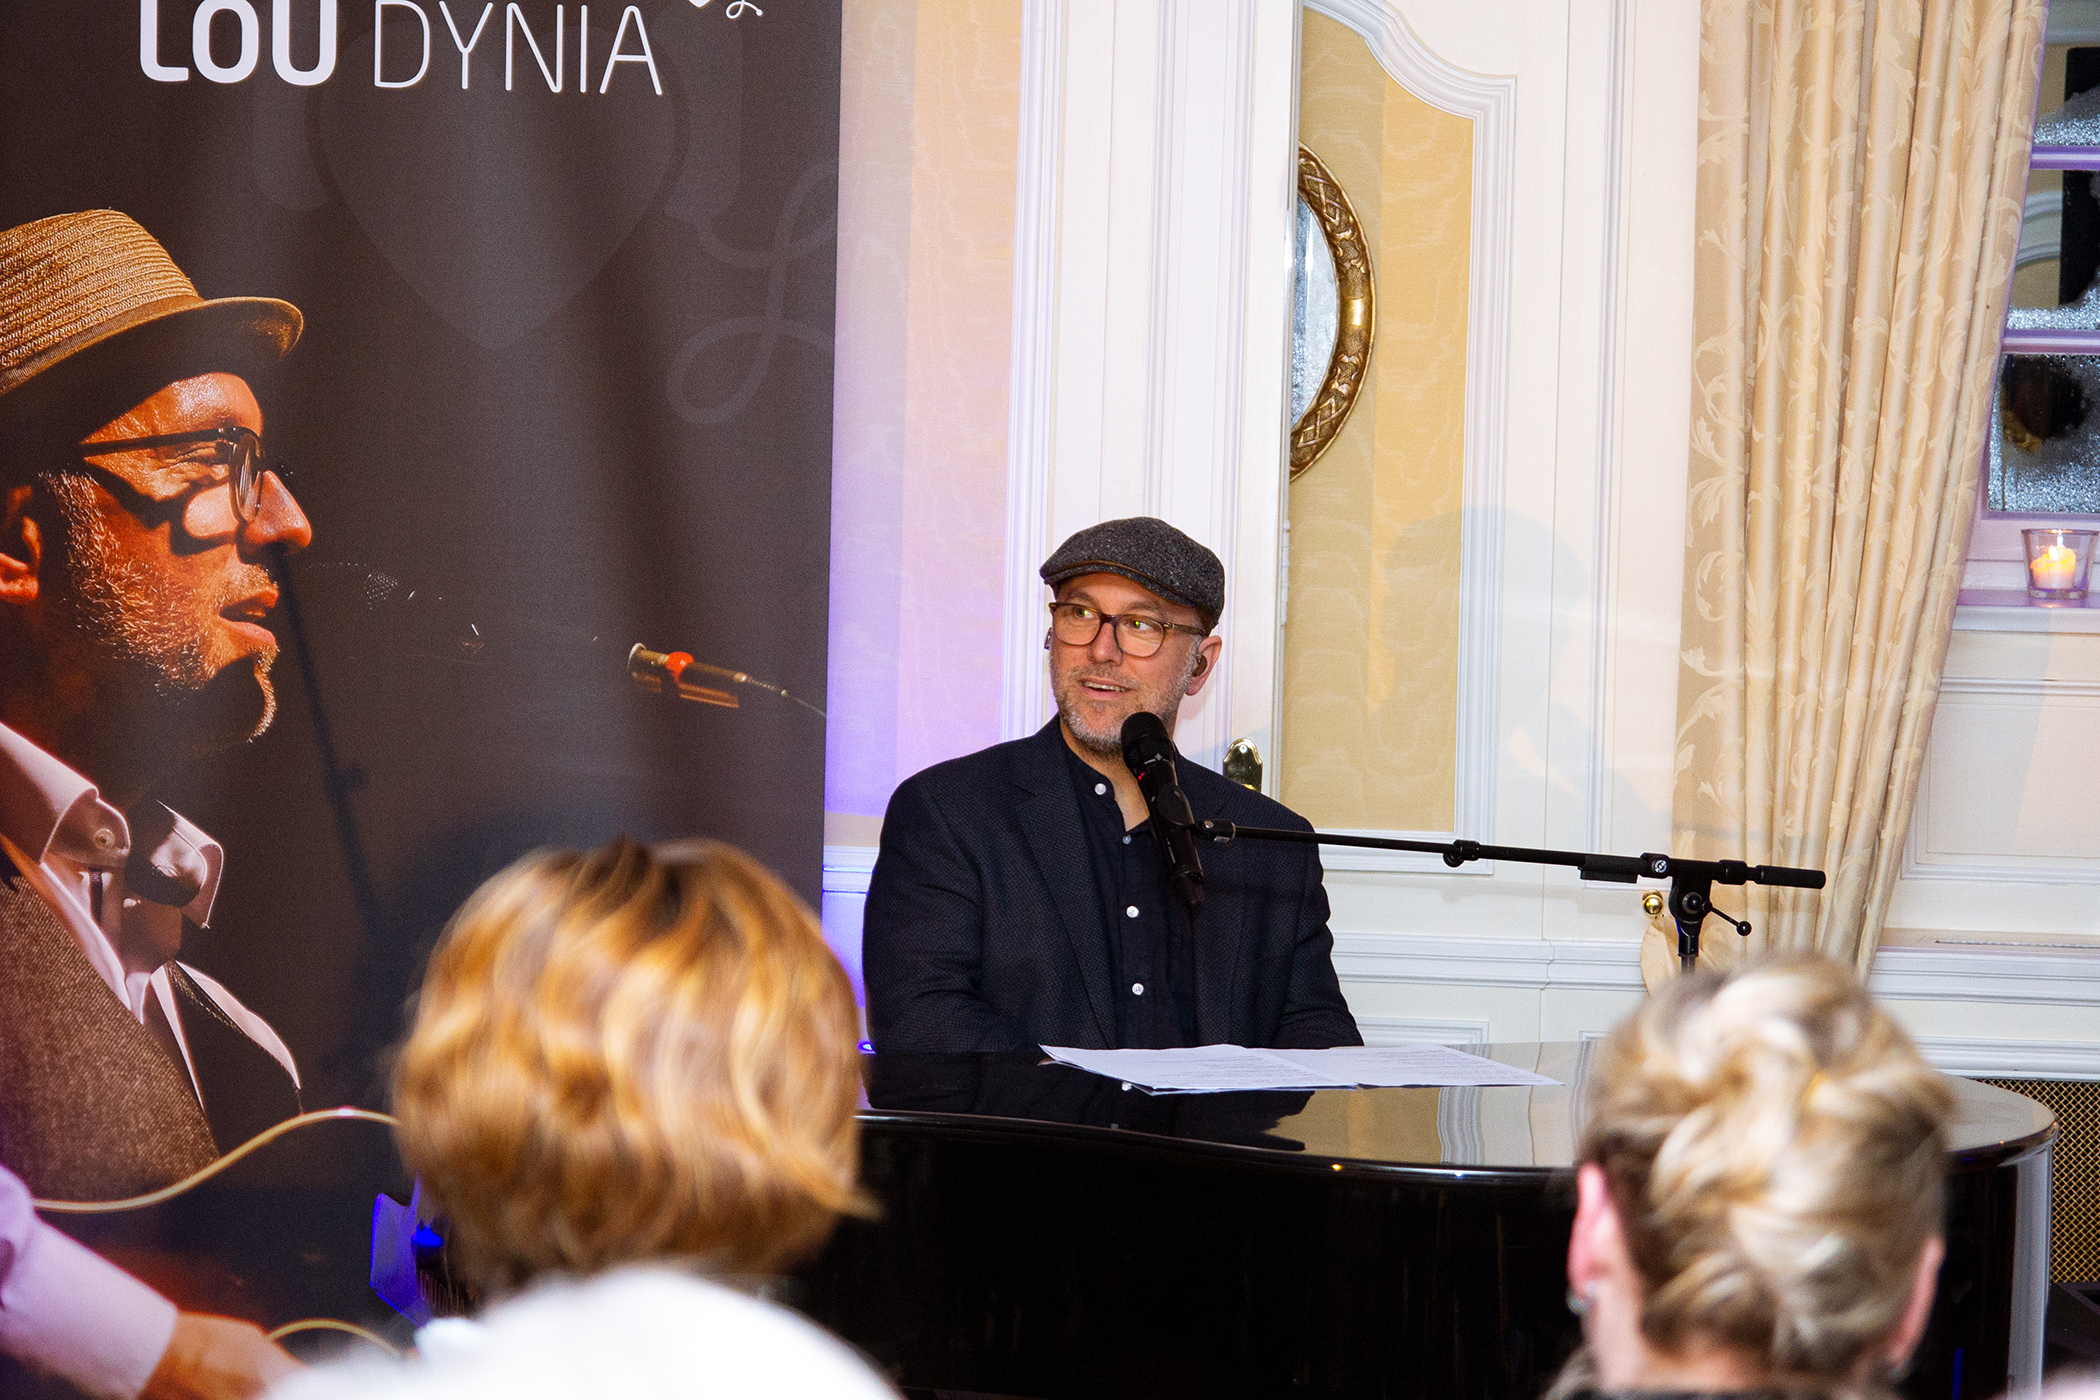 Lou Dynia verzauberte sein Publikum im Parkhotel Wasserburg